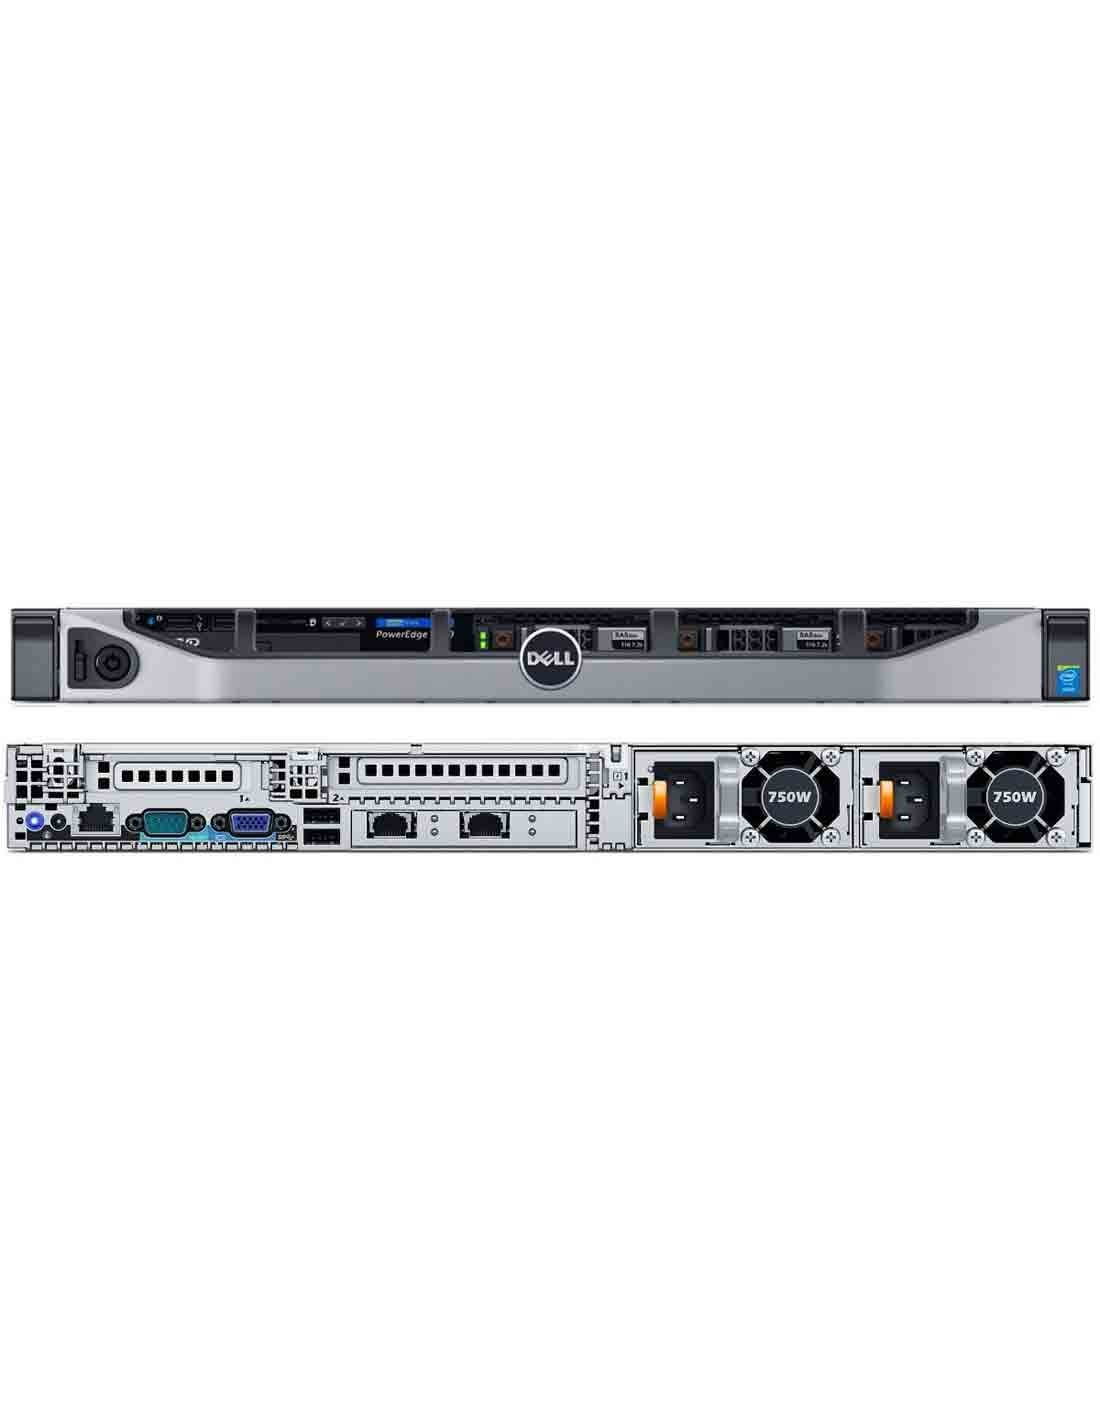 Dell PowerEdge R630 Rack Server delivers versatile performace.